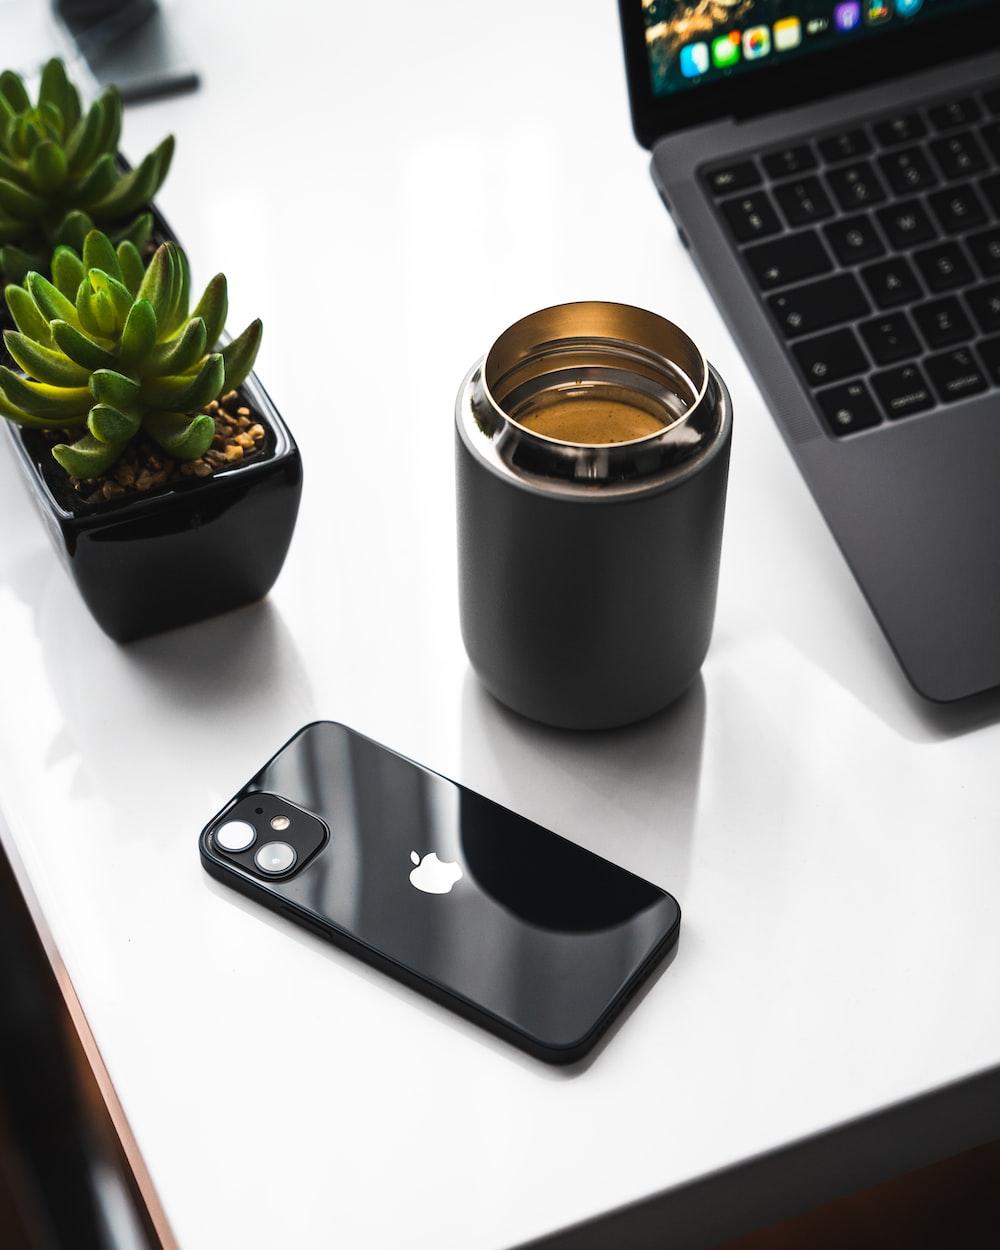 silver iphone 6 beside black ceramic mug on white table